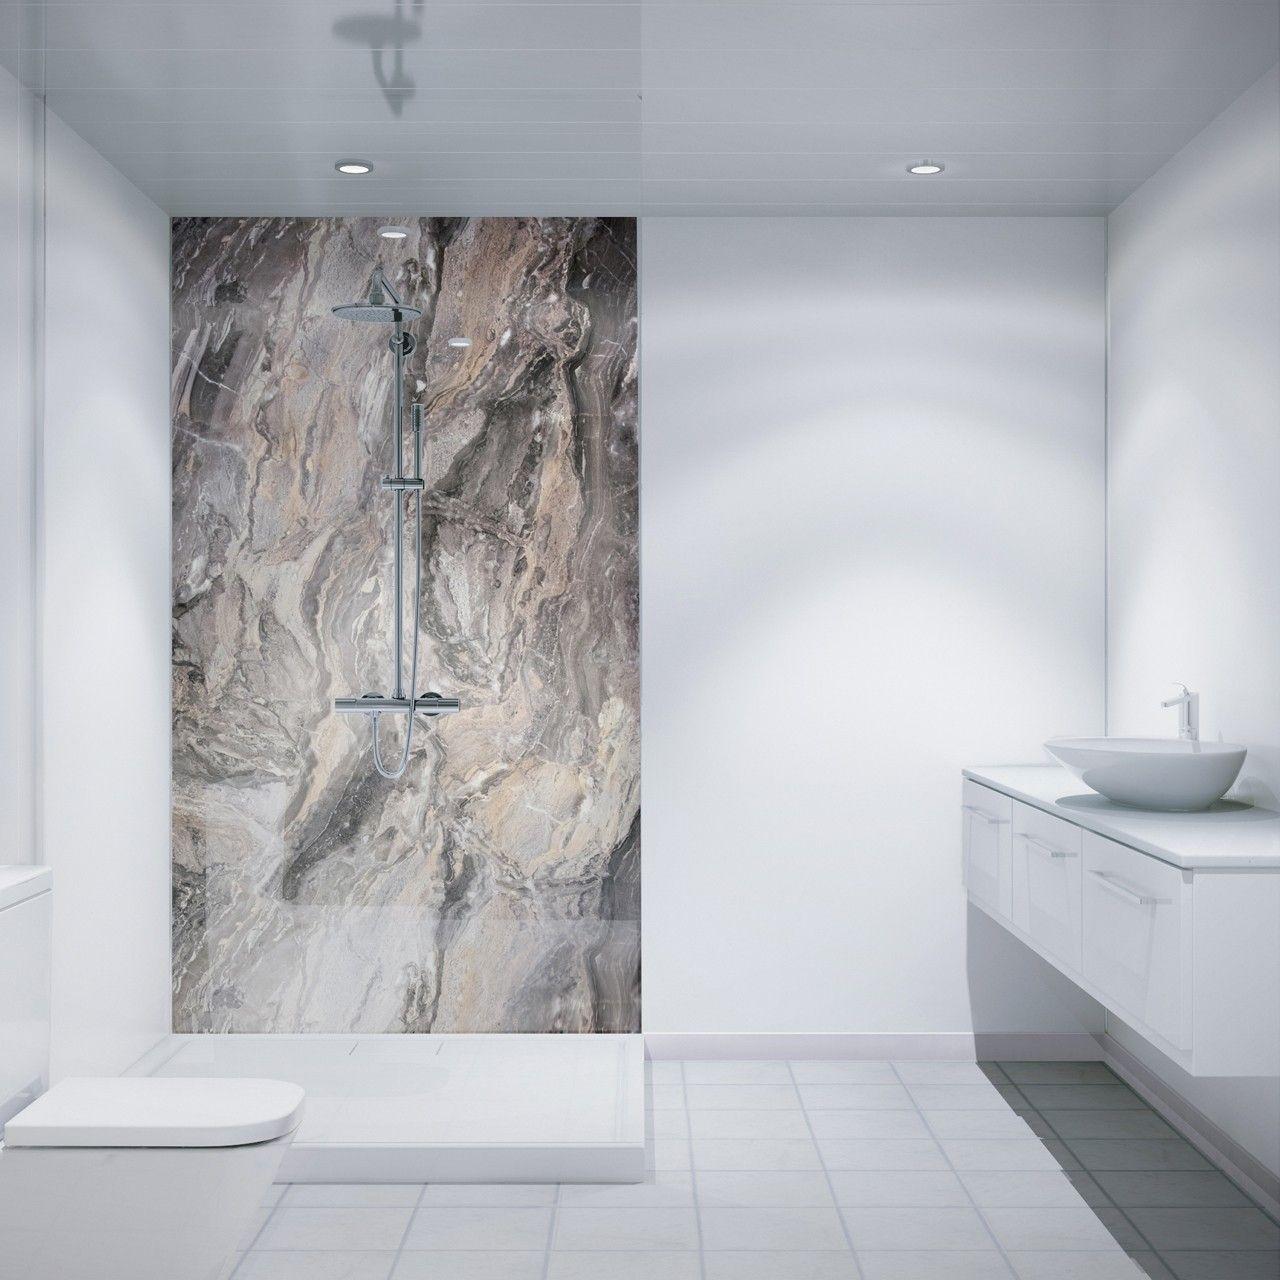 20 Bathroom Wall Board Magzhouse, Waterproof Paneling For Bathrooms